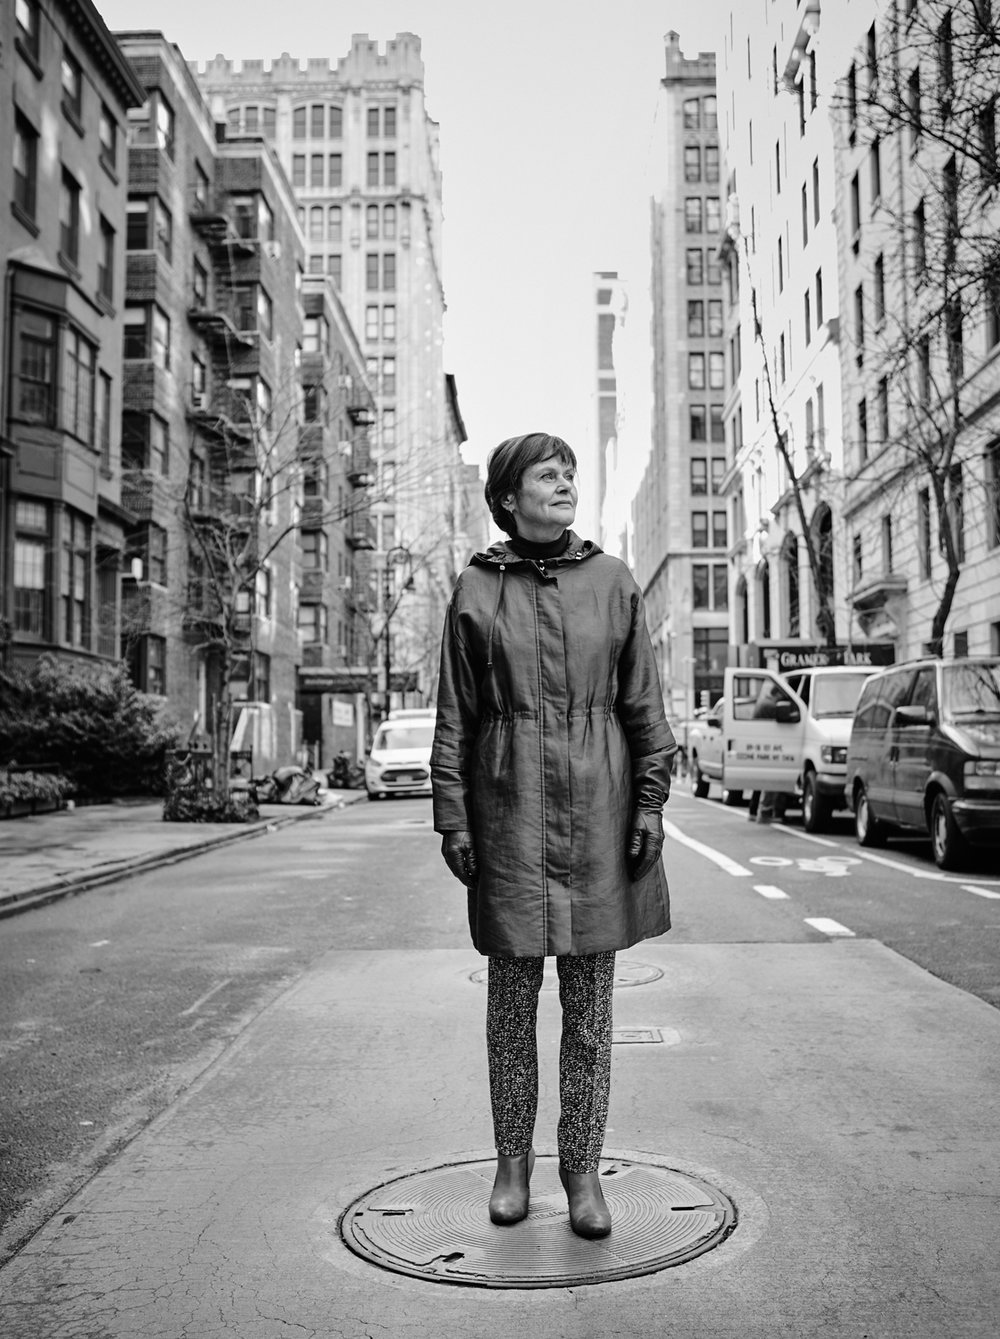 Unn Magnussen, Gramercy Park, New York 2017